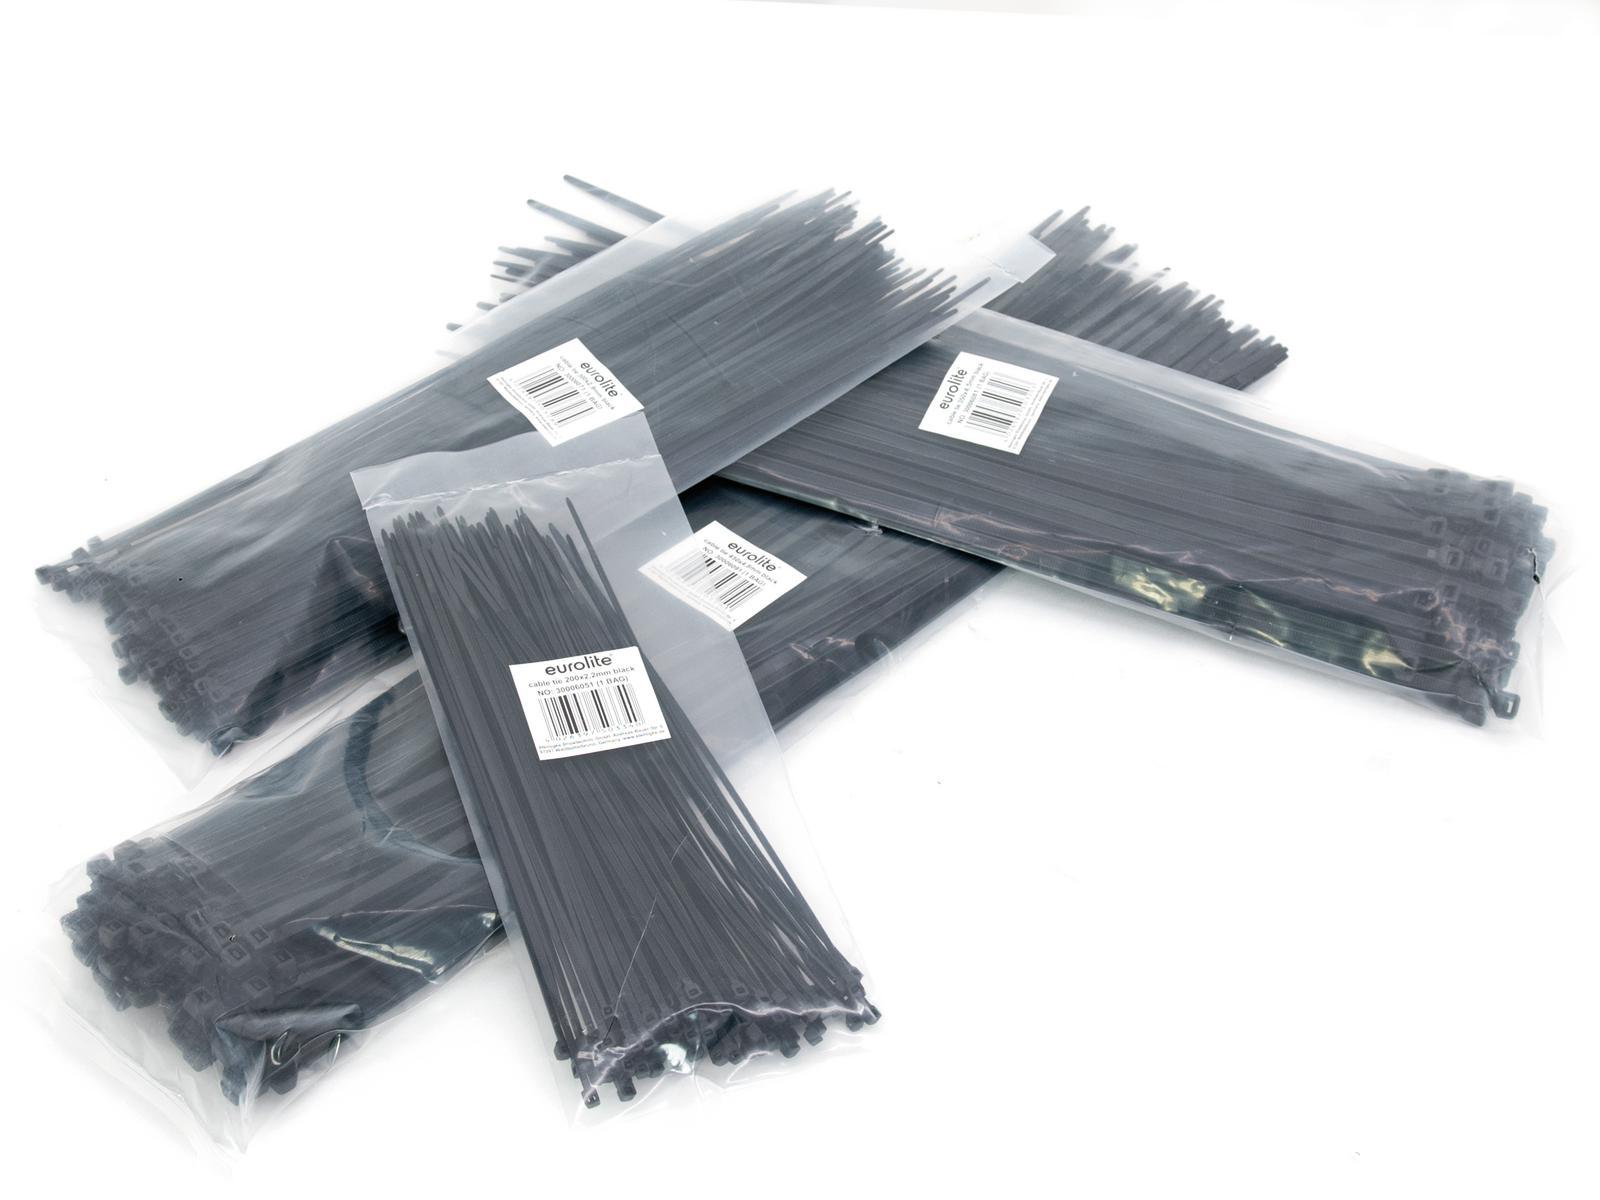 EUROLITE Cavo cravatta 350x4.5mm nero 100x